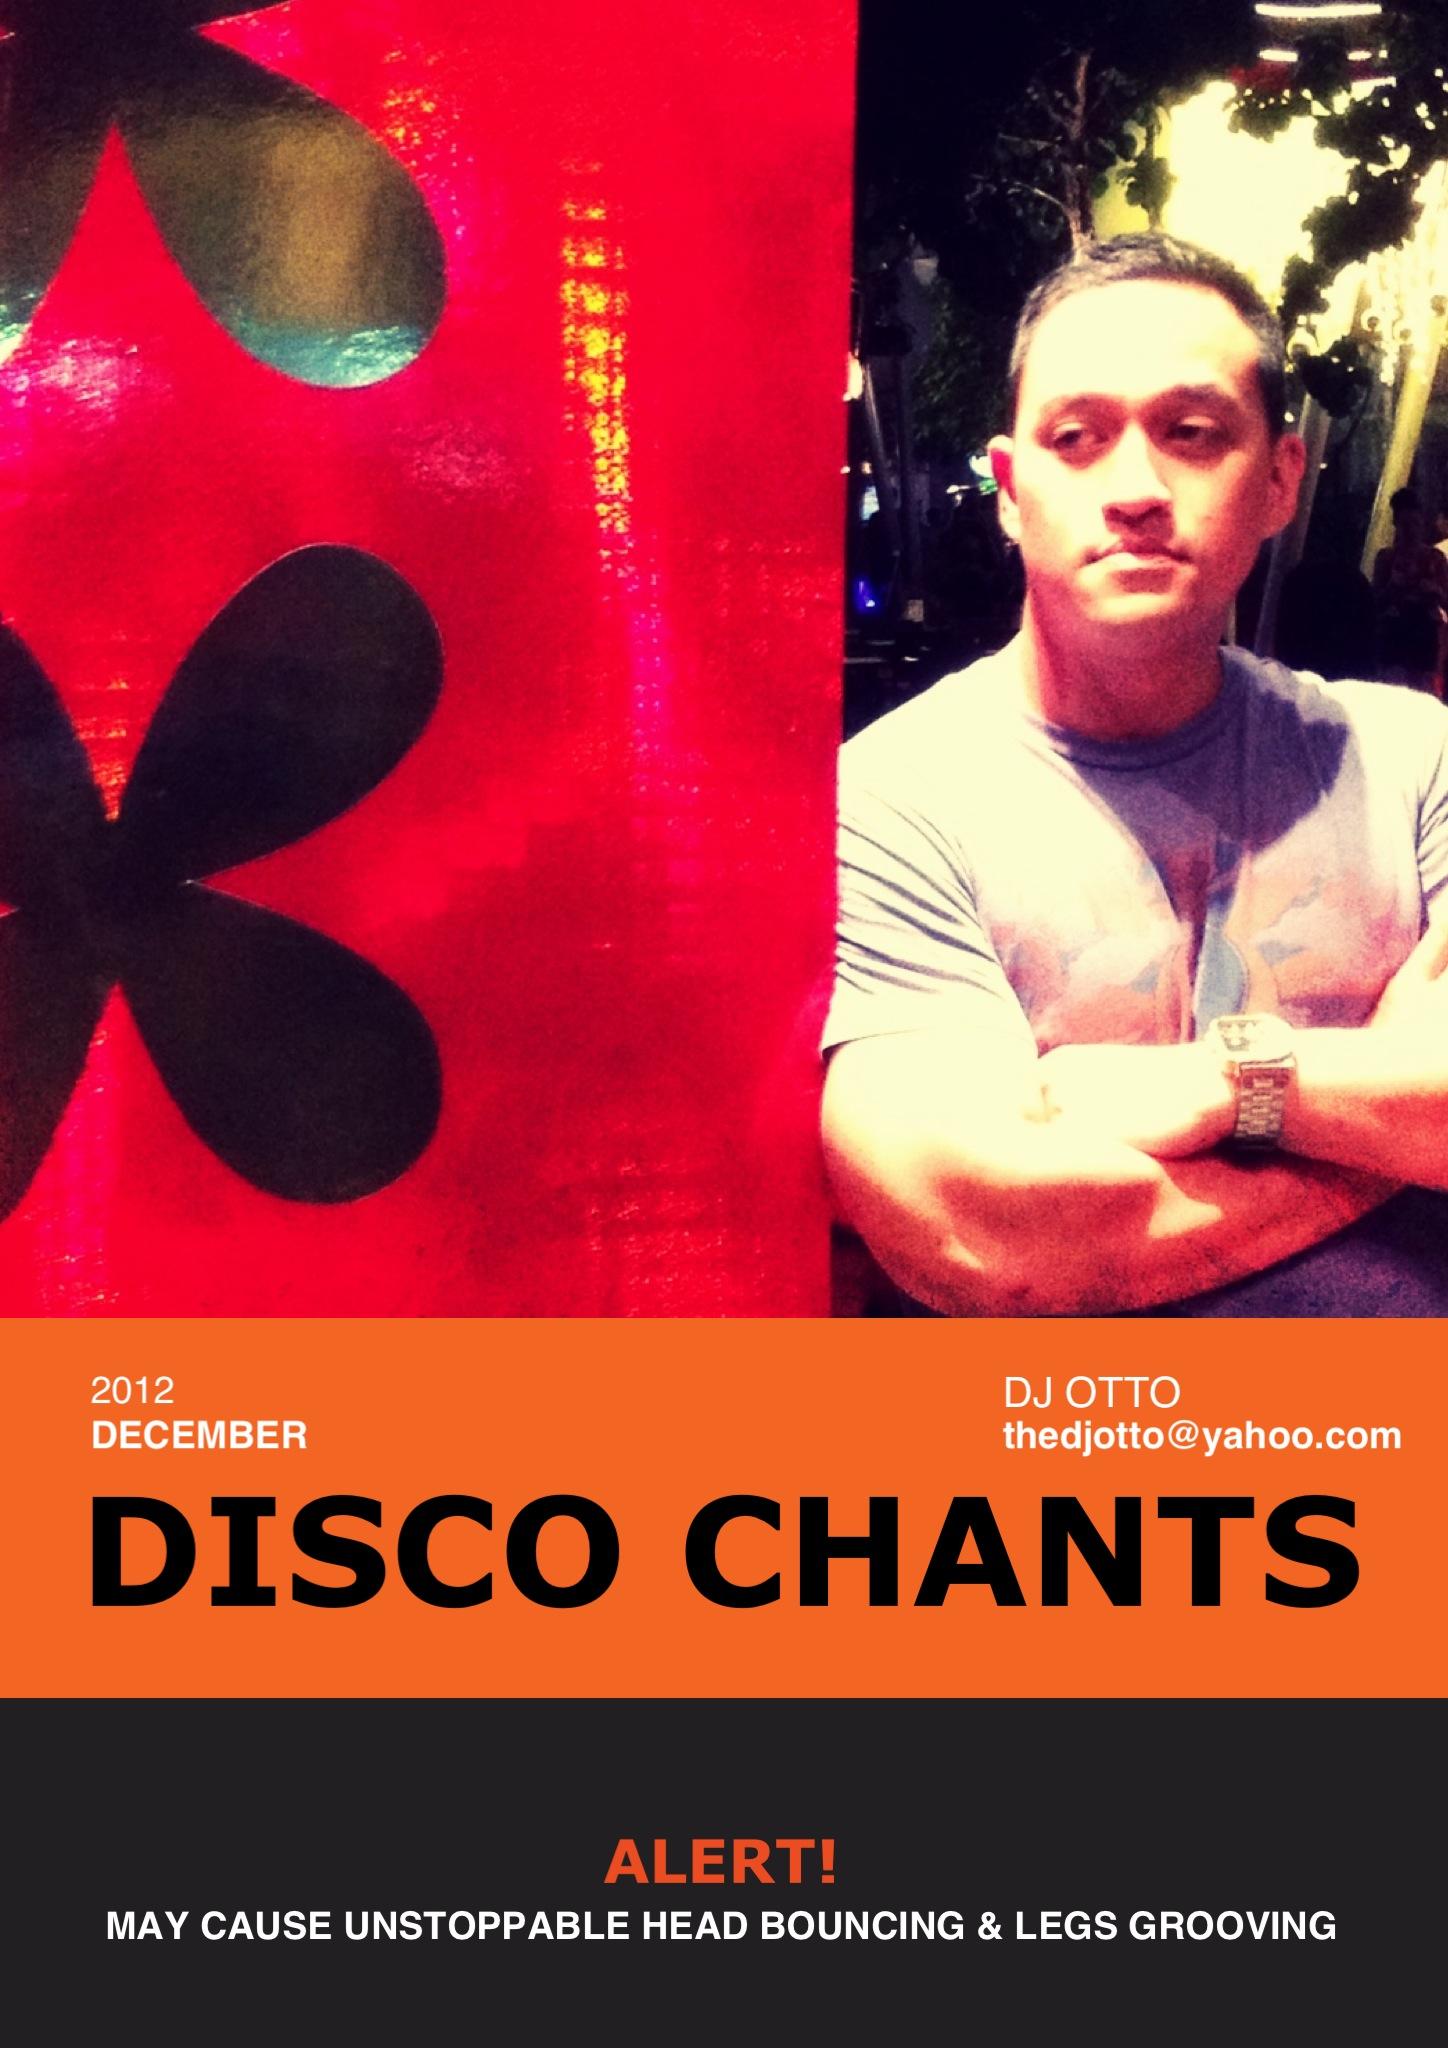 DISCO CHANTS 2012